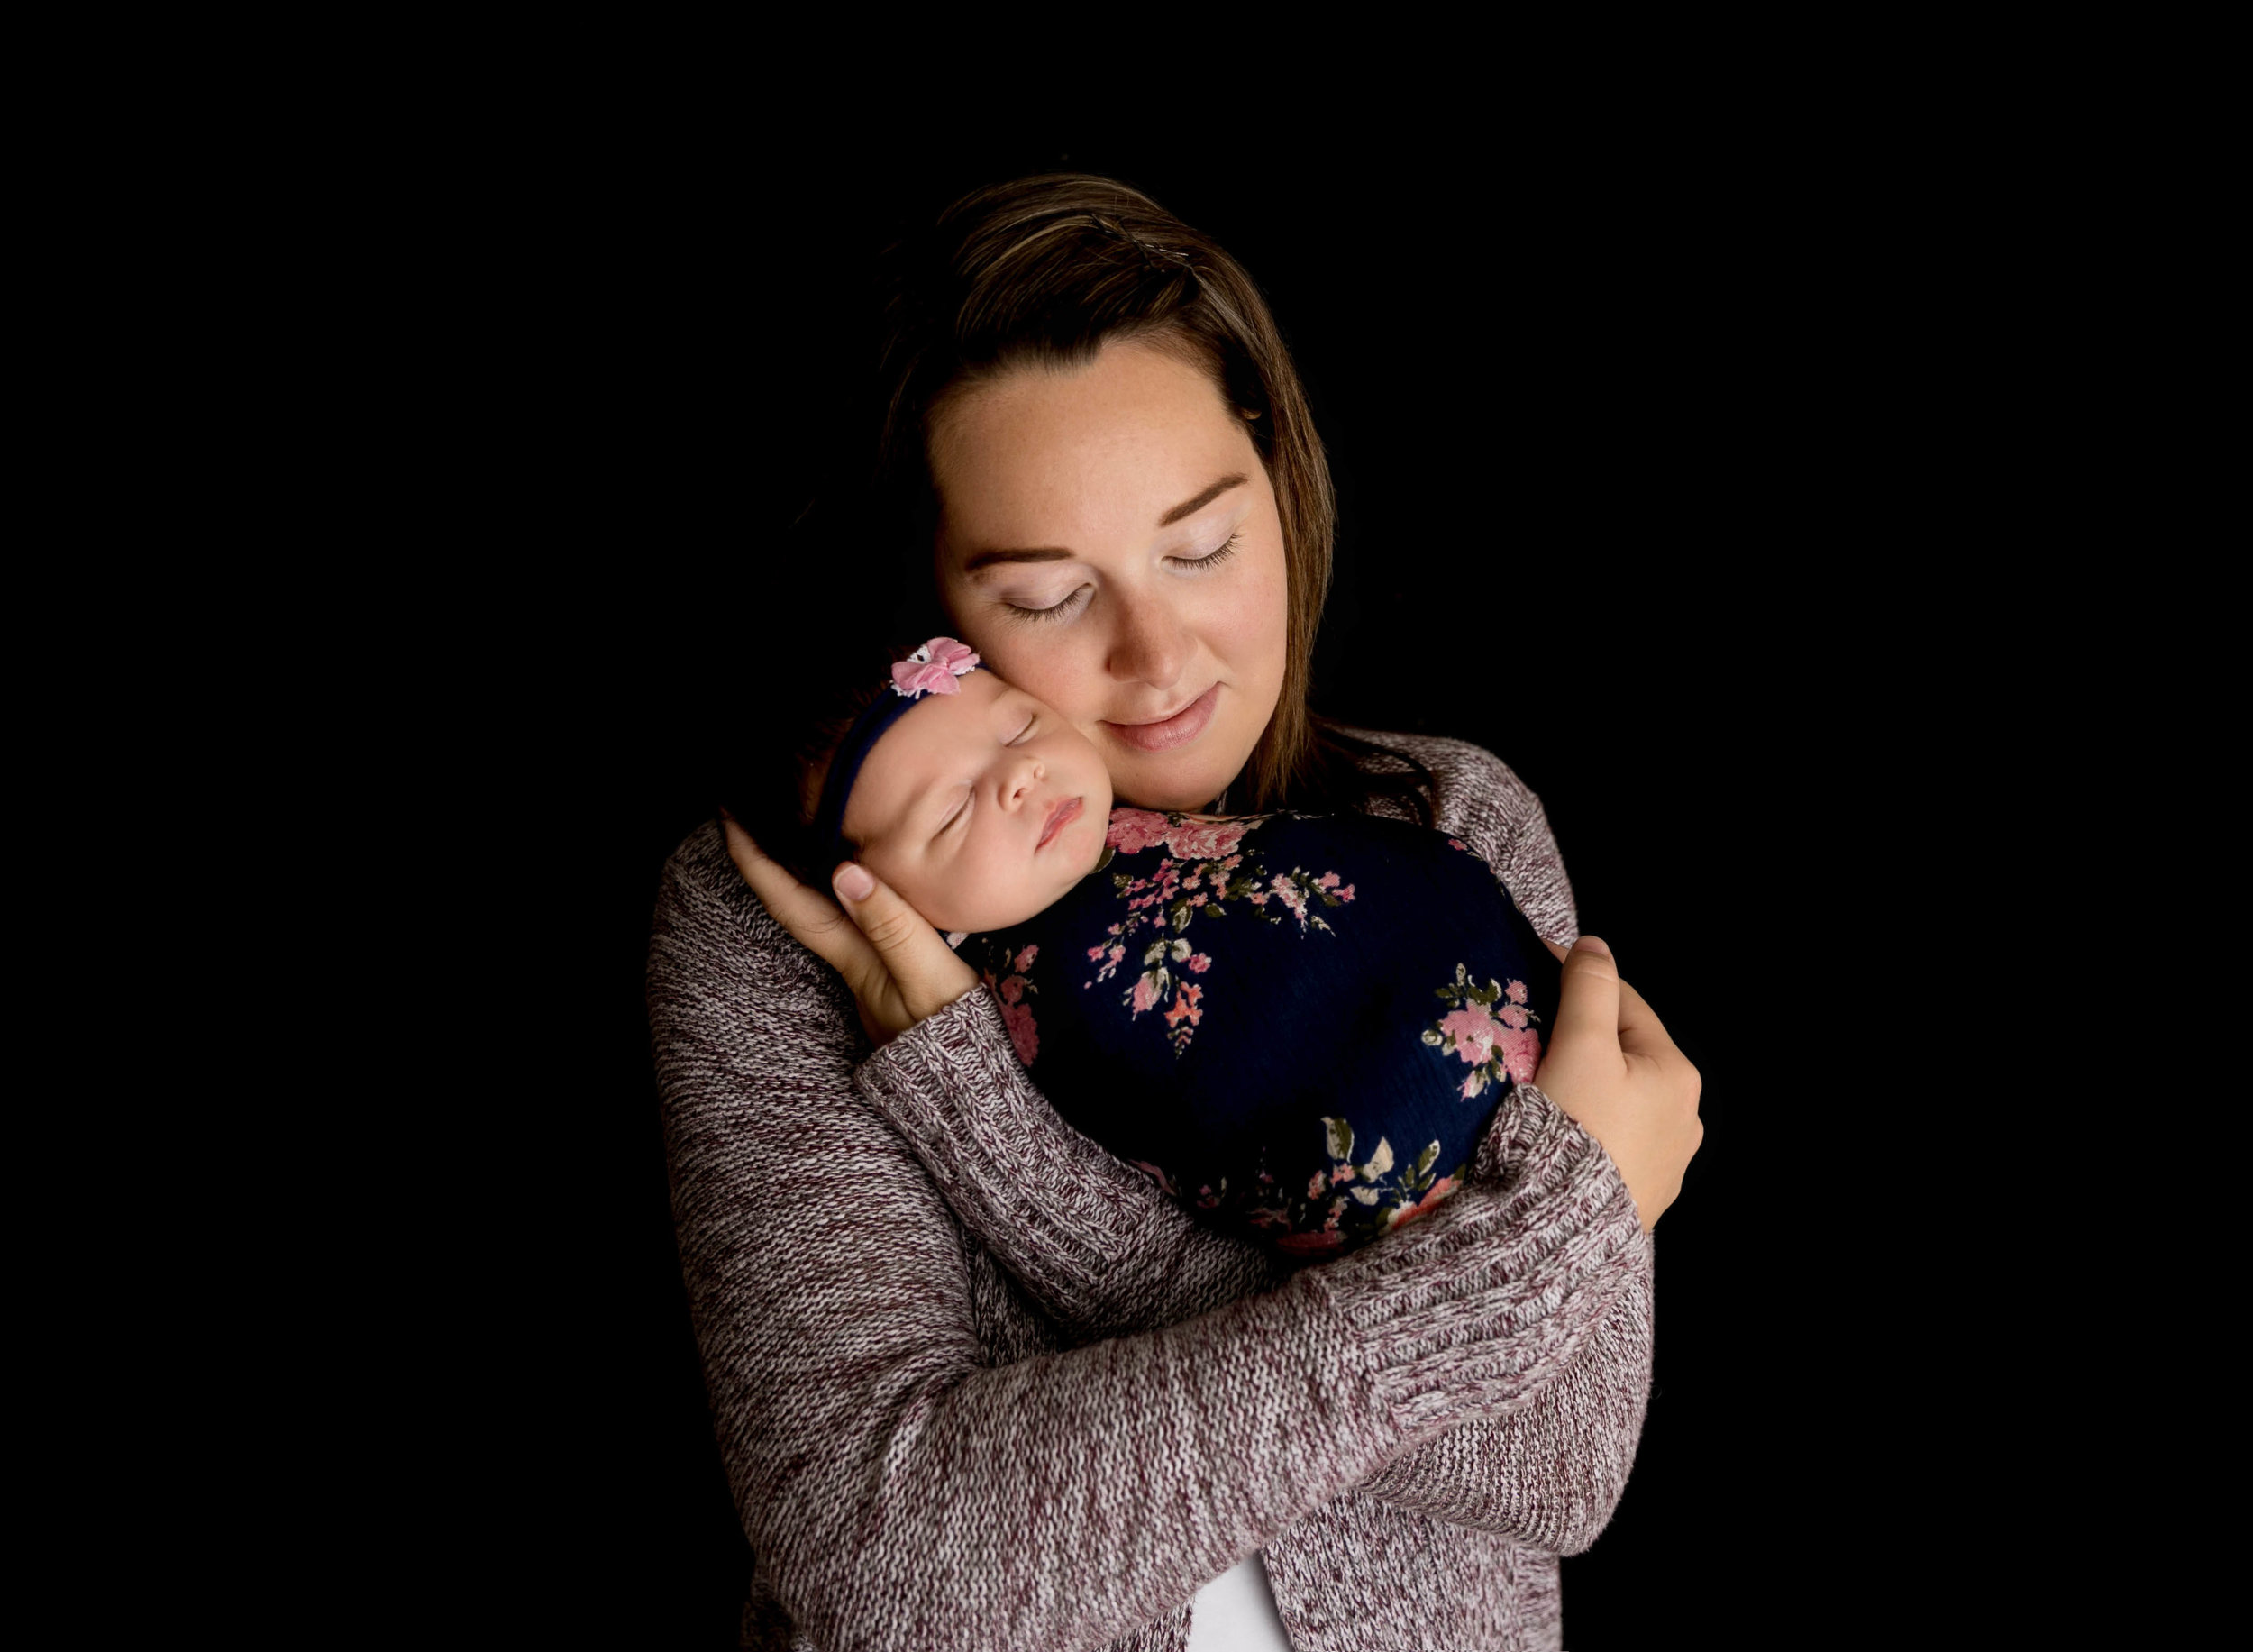 Newborn Photography | Newborn Photographer | Kawartha Lakes Photographer | Lindsay Photographer | Lindsay Ontario Photographer | Kawartha Lakes Photographer | Kawartha Lakes Favourite Photographer | Readers Choice Awards | Morgan Bress Photography | Makenzie Dodds | Megan Dodds | Mother Daughter Pose |